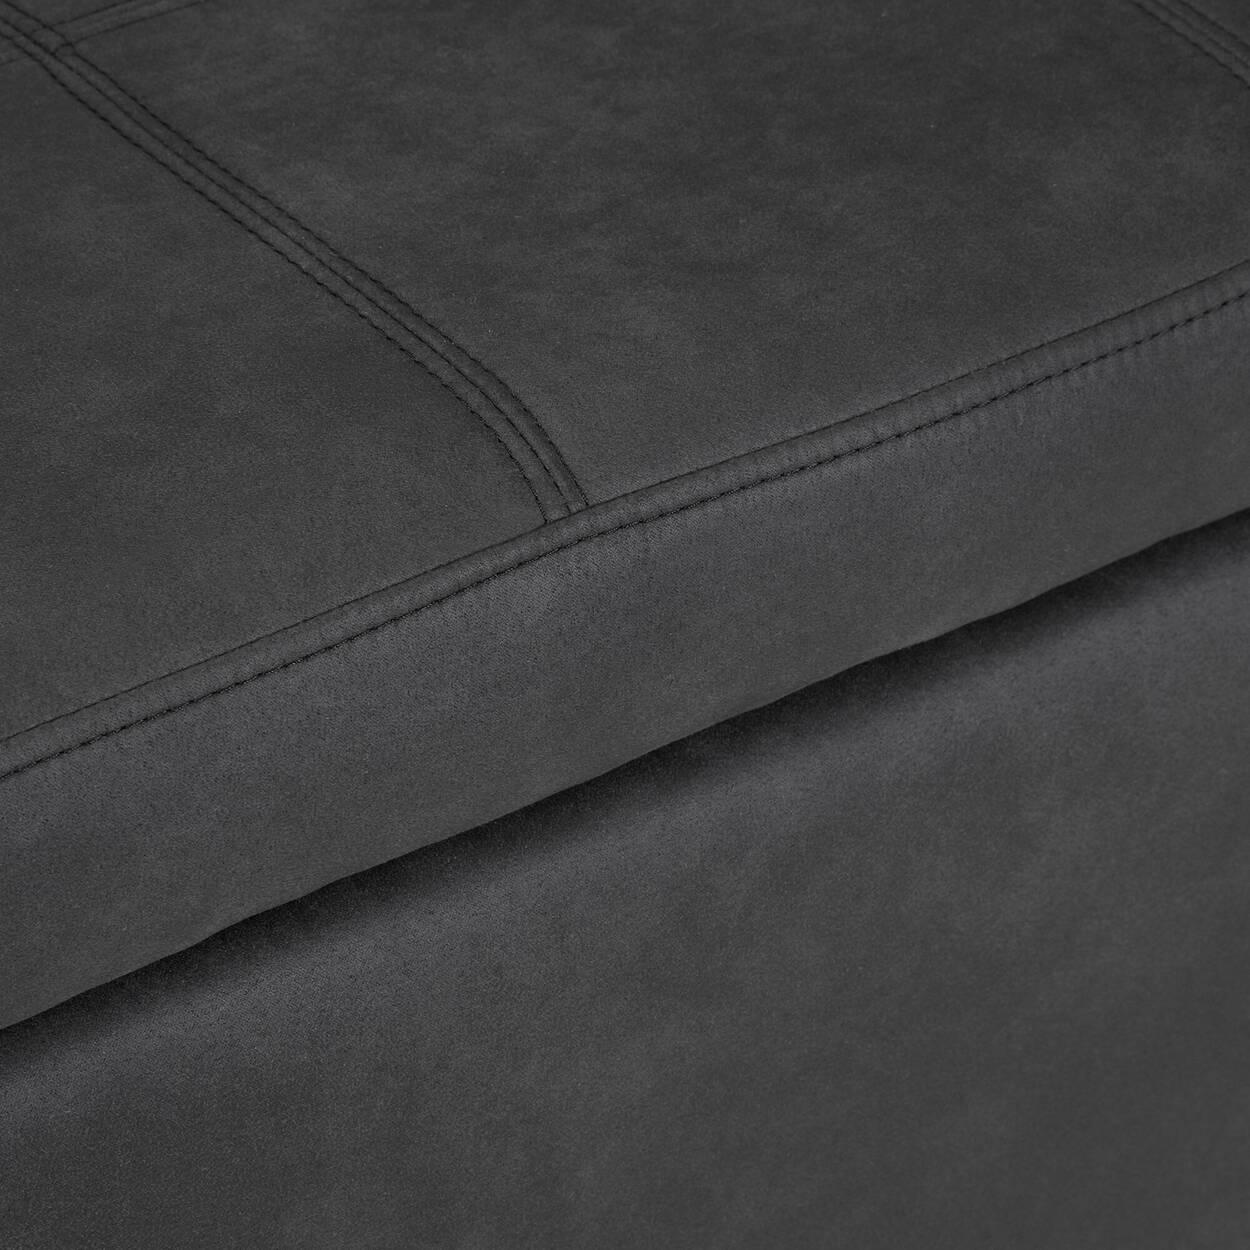 Textured Faux Leather Storage Ottoman